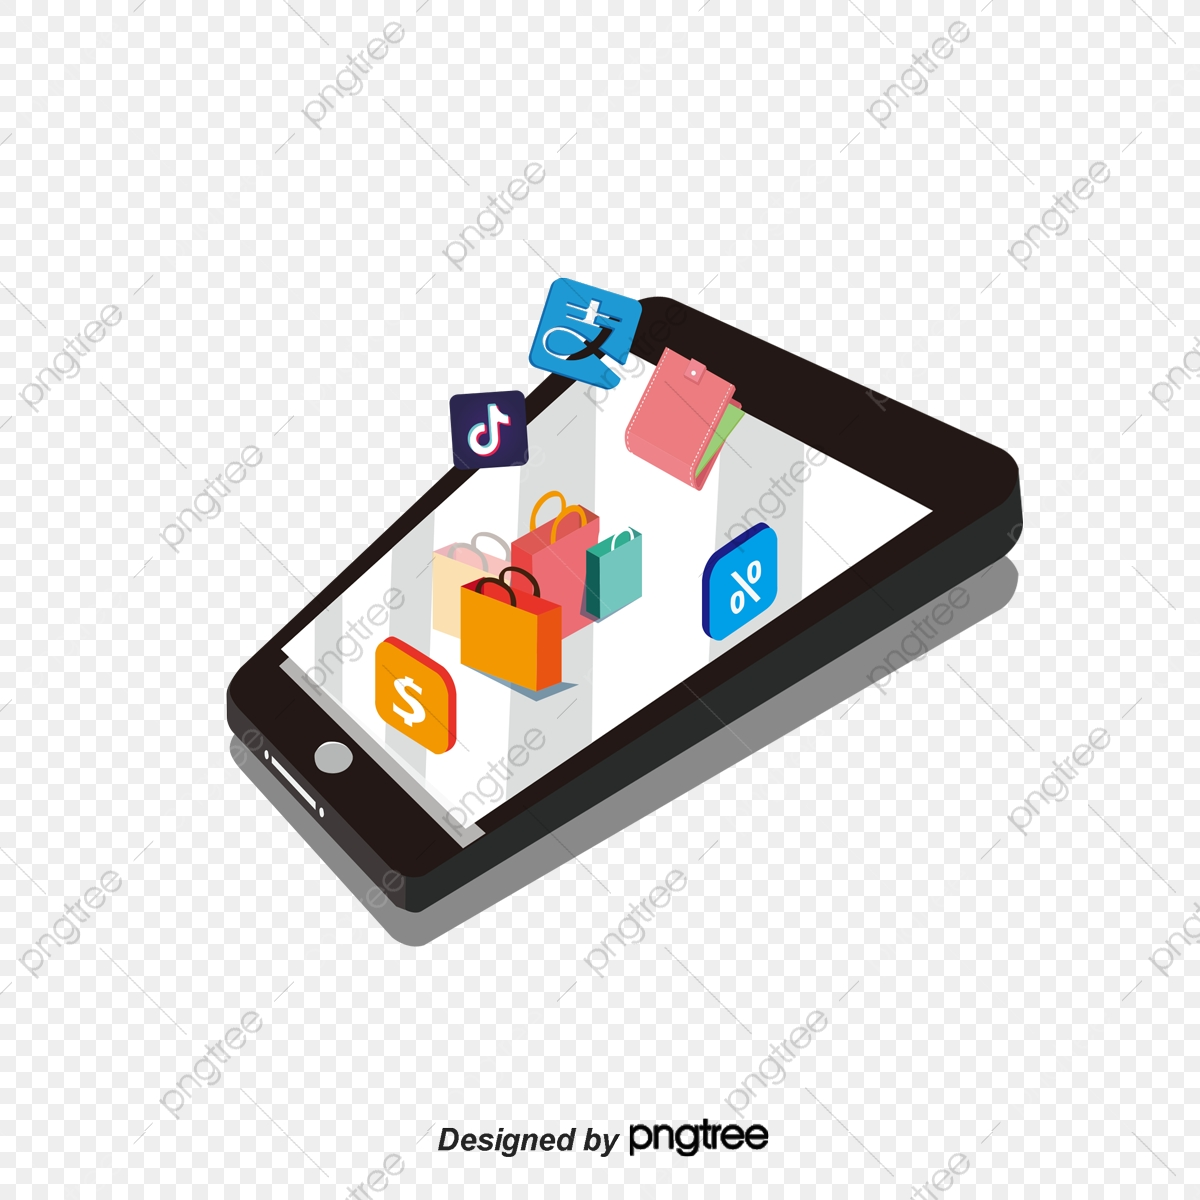 Mobile Application, App, Icon, Music PNG Transparent Clipart.